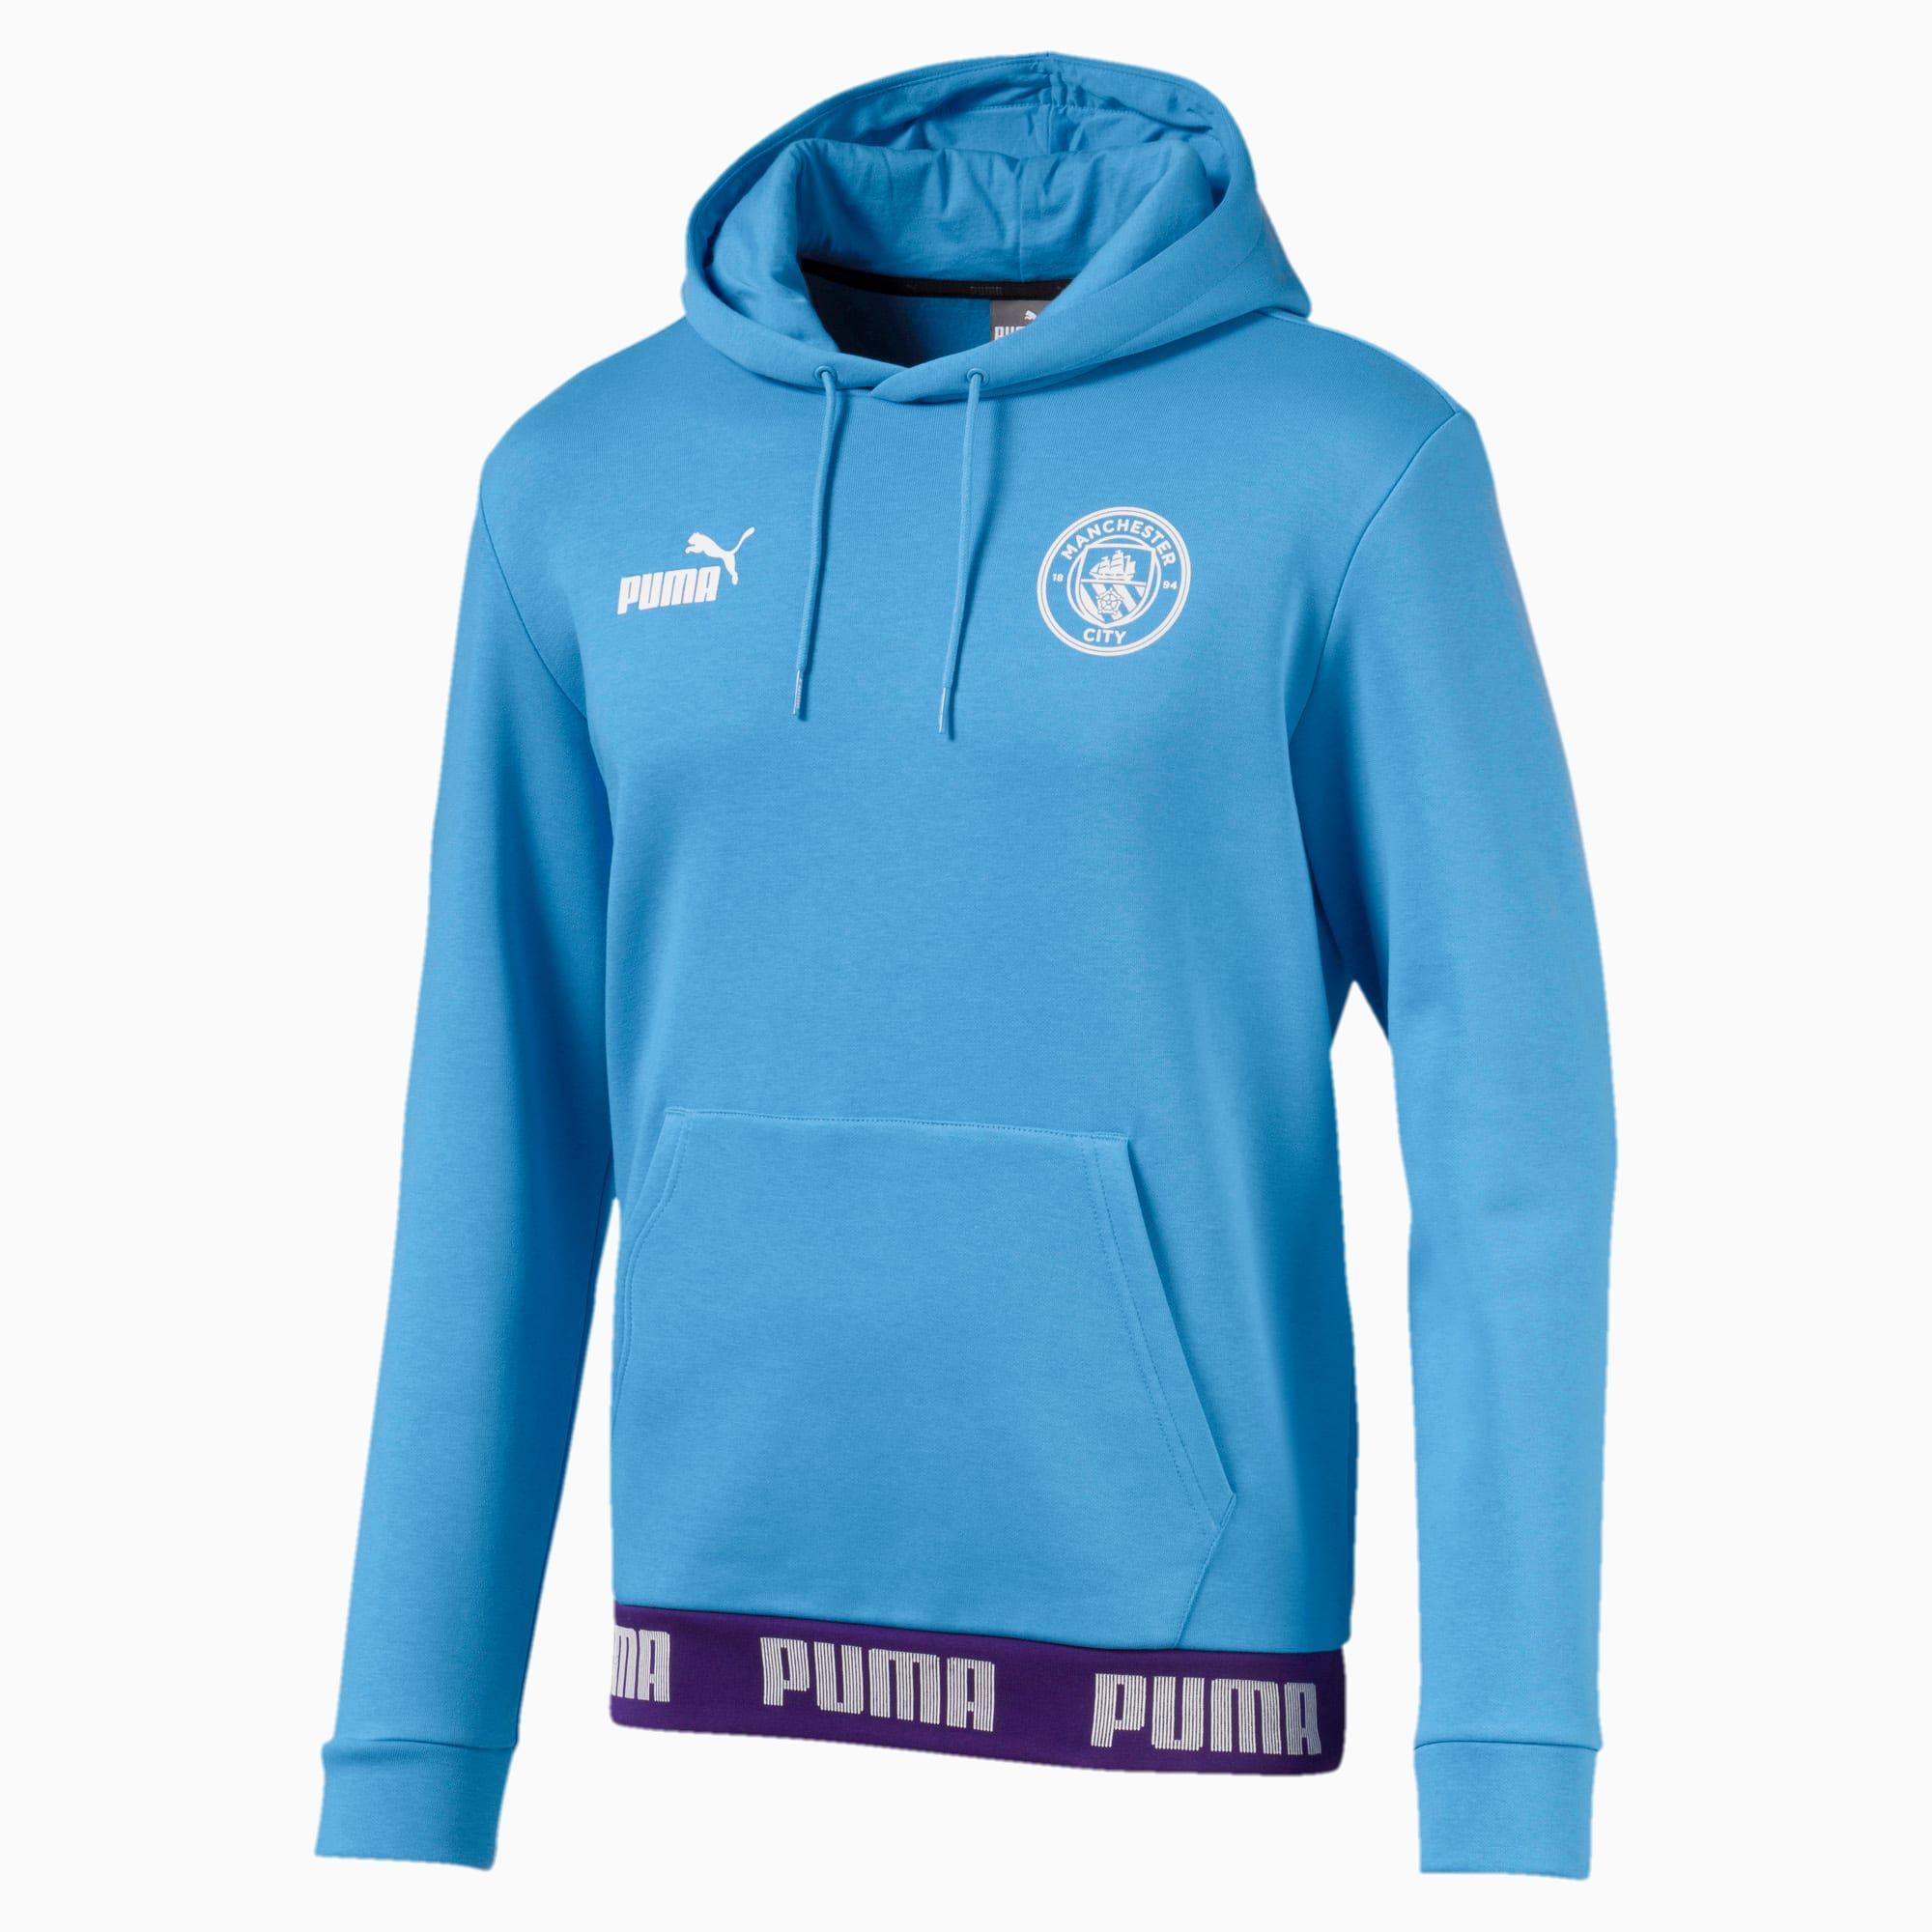 PUMA Man City Football Culture Men's Hoodie, Light Blue/White, size Large, Clothing